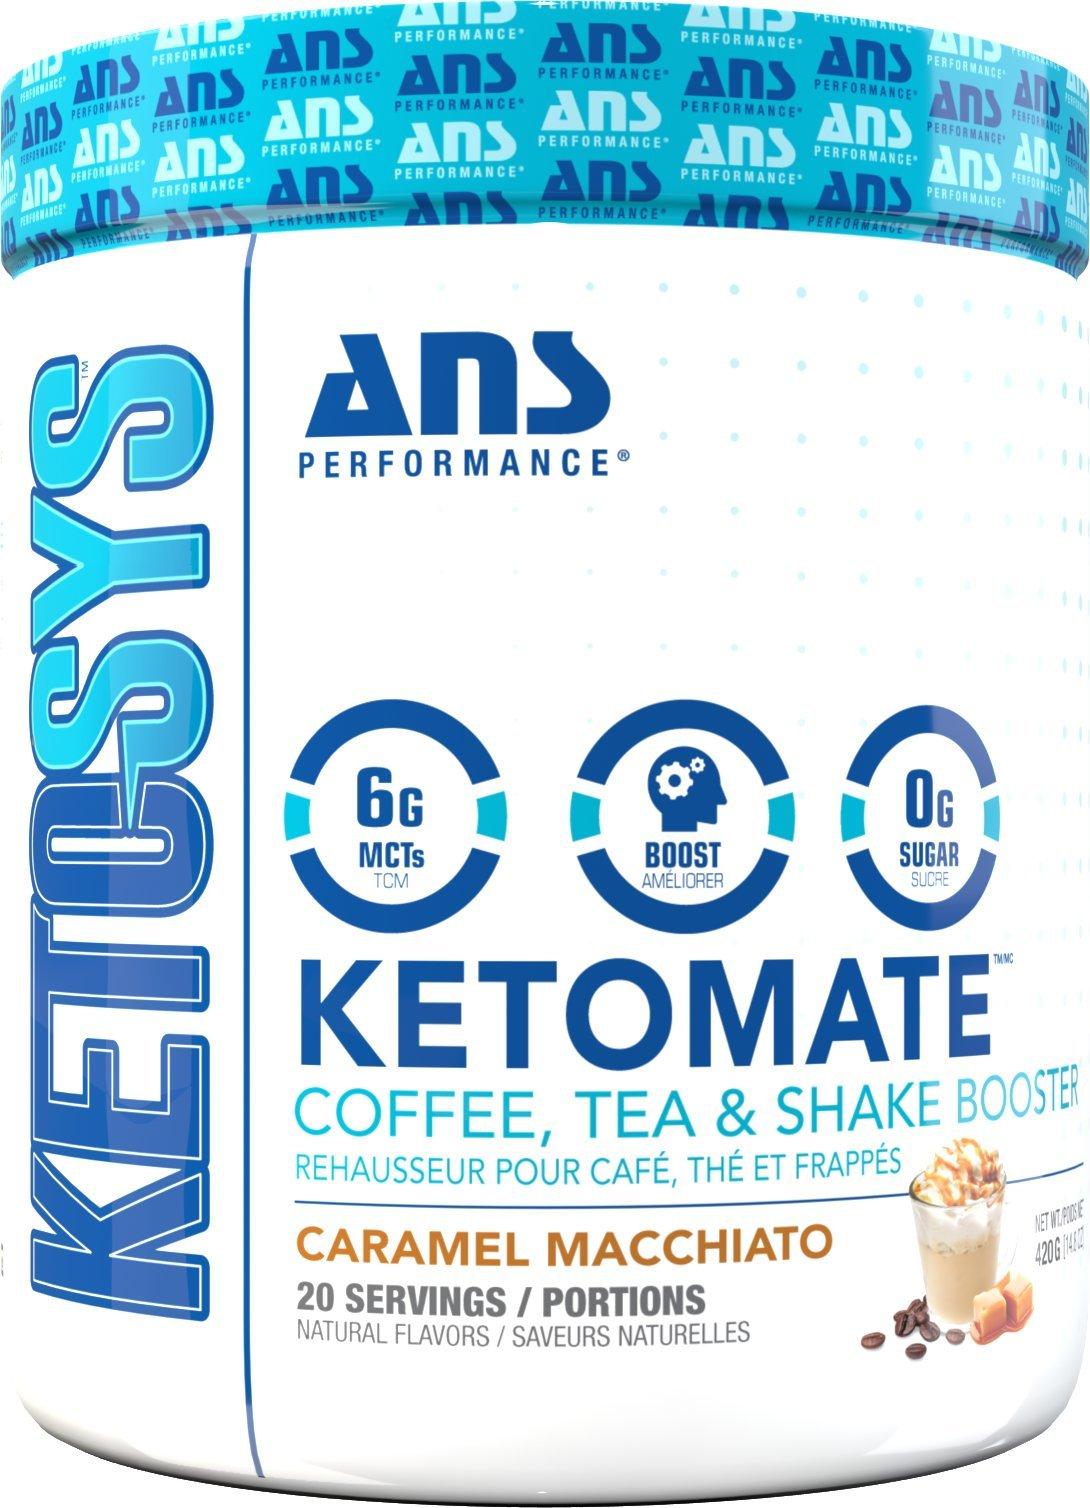 Ketomate - Ketogenic Keto Booster Creamer for Coffee, Tea & Shakes | Zero Sugar & Low Carb Keto Friendly Beverage Enhancer | Boost Energy, Metabolism & Mental Focus (Caramel Macchiato)